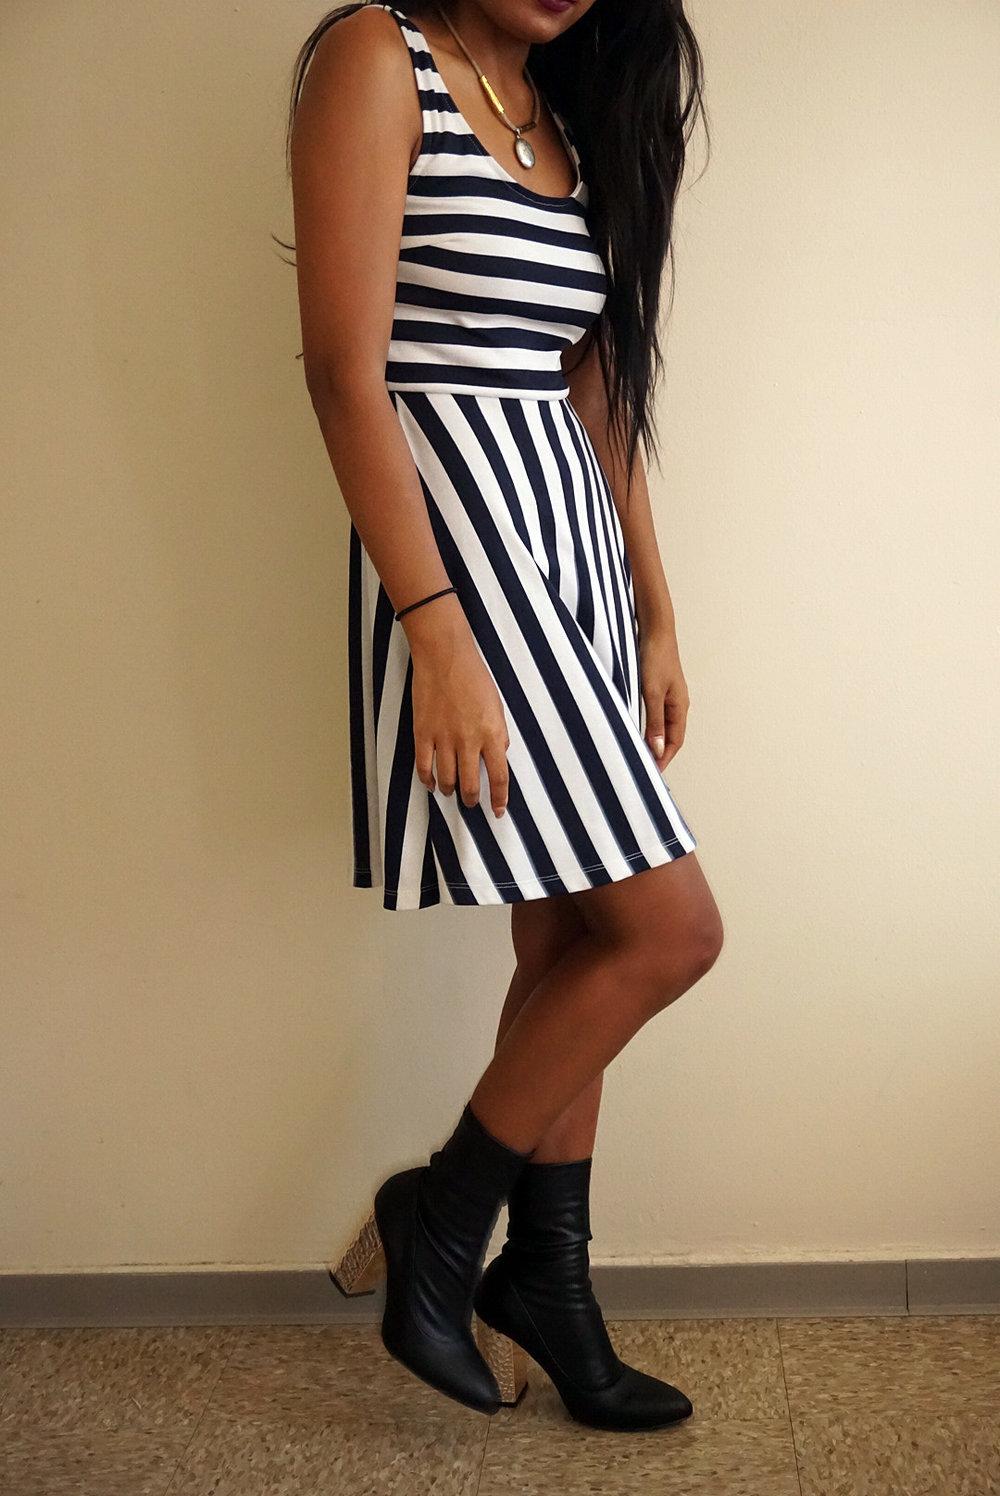 Striped-Dress-Black-Amiclubwear-Boots-Fall-Style-Blogger-LINDATENCHITRAN-6-1616x1080.jpg